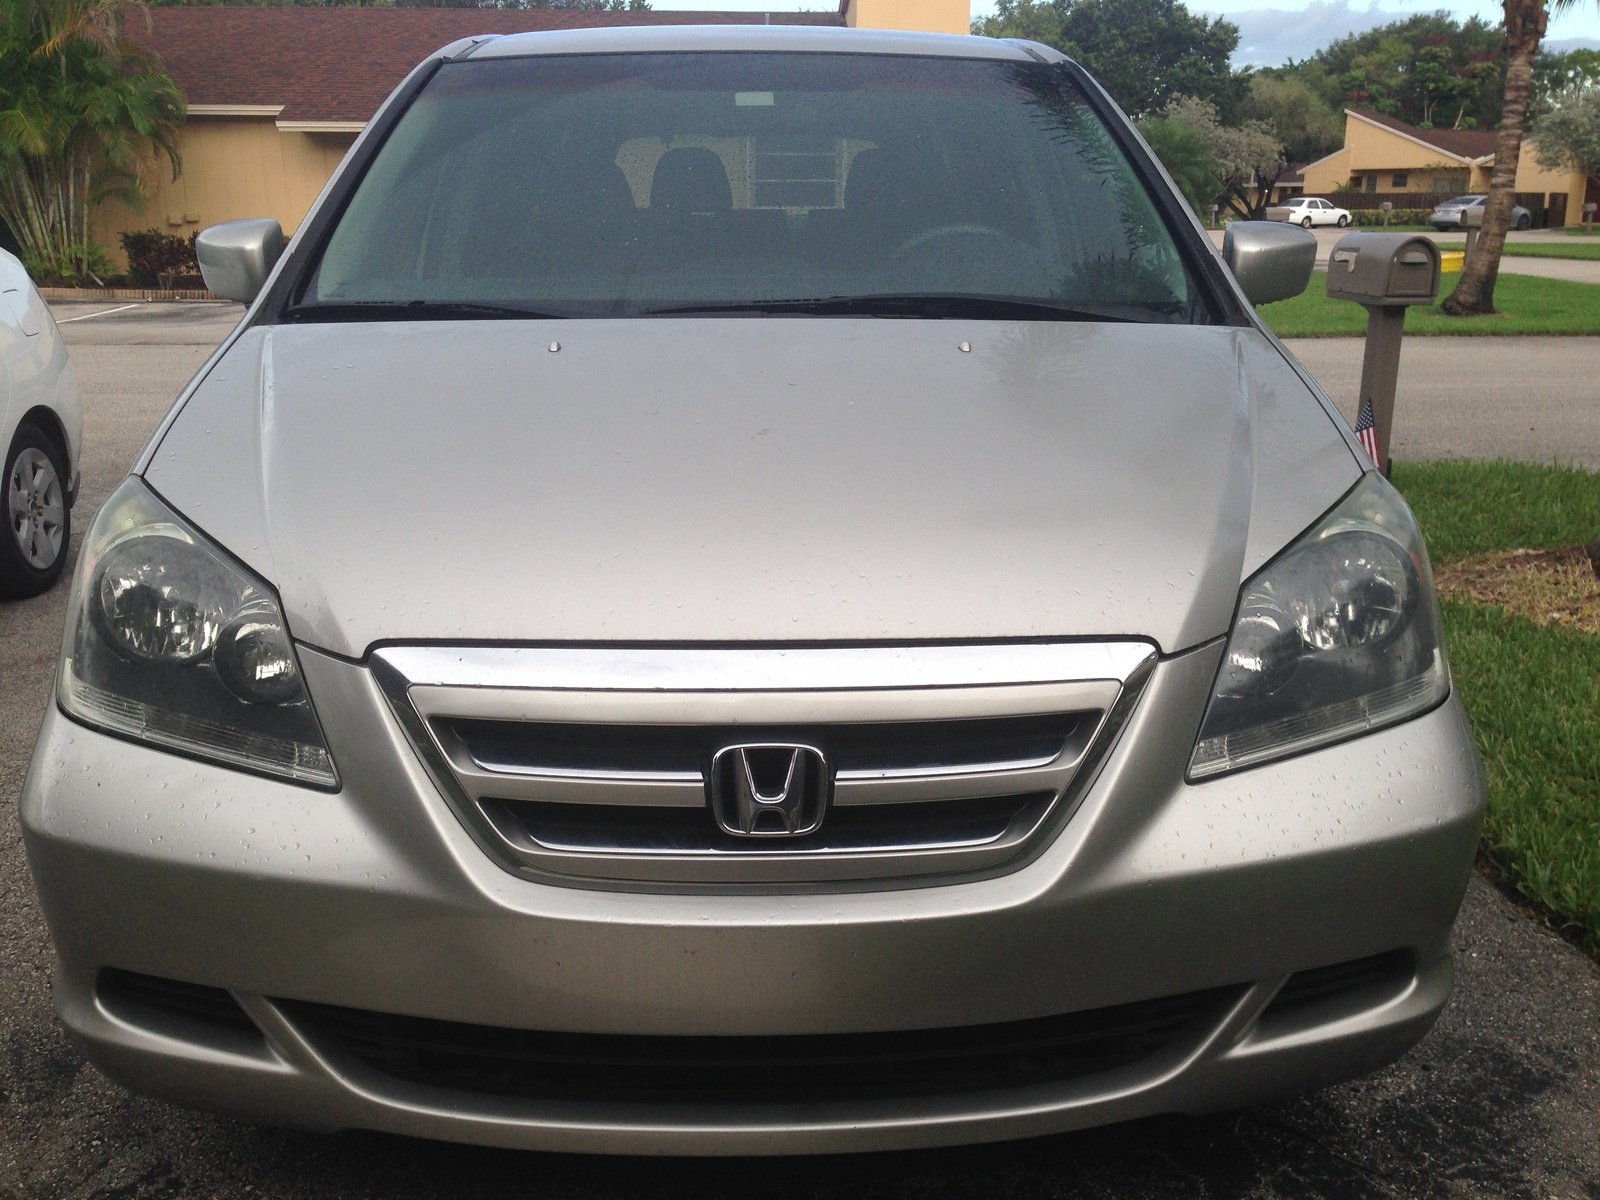 2006 Honda Odyssey - Overview - CarGurus